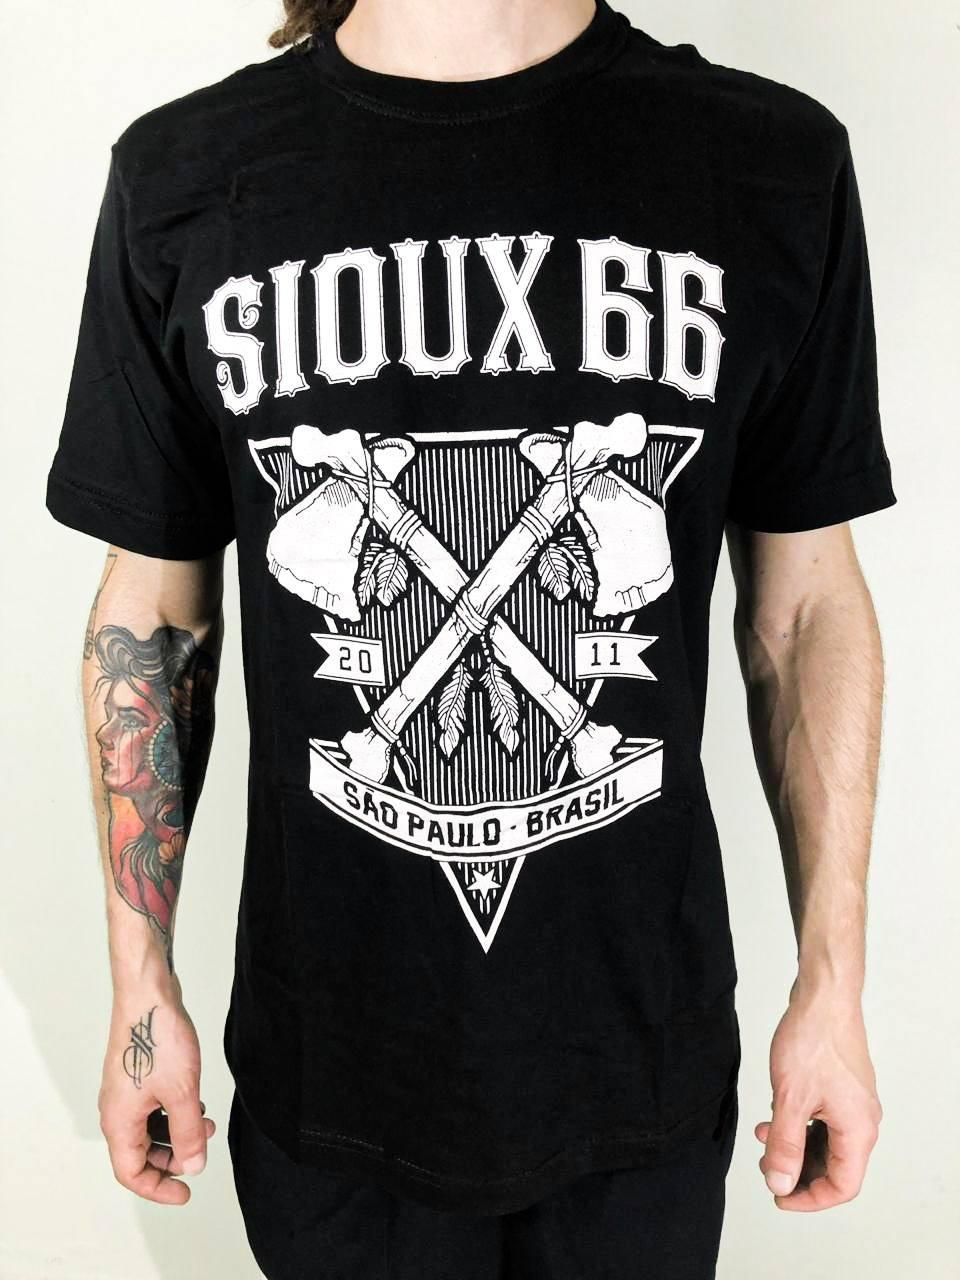 Camiseta Sioux 66 Manga Curta